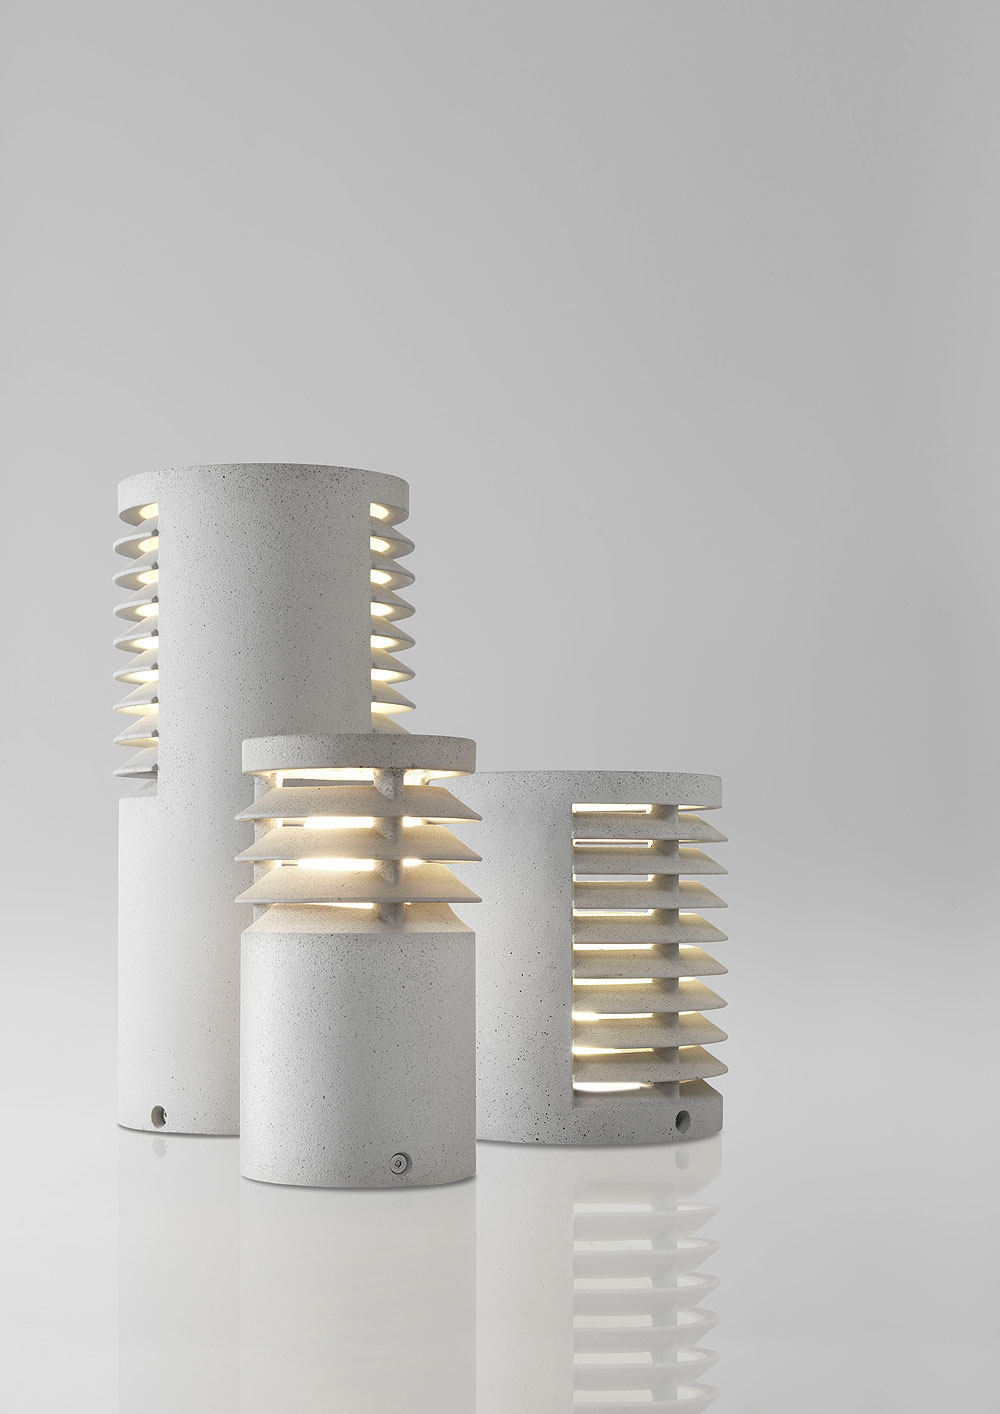 iluminacion-stones-oliver-ramon-ubeda-otto-canalda-metalarte (3)